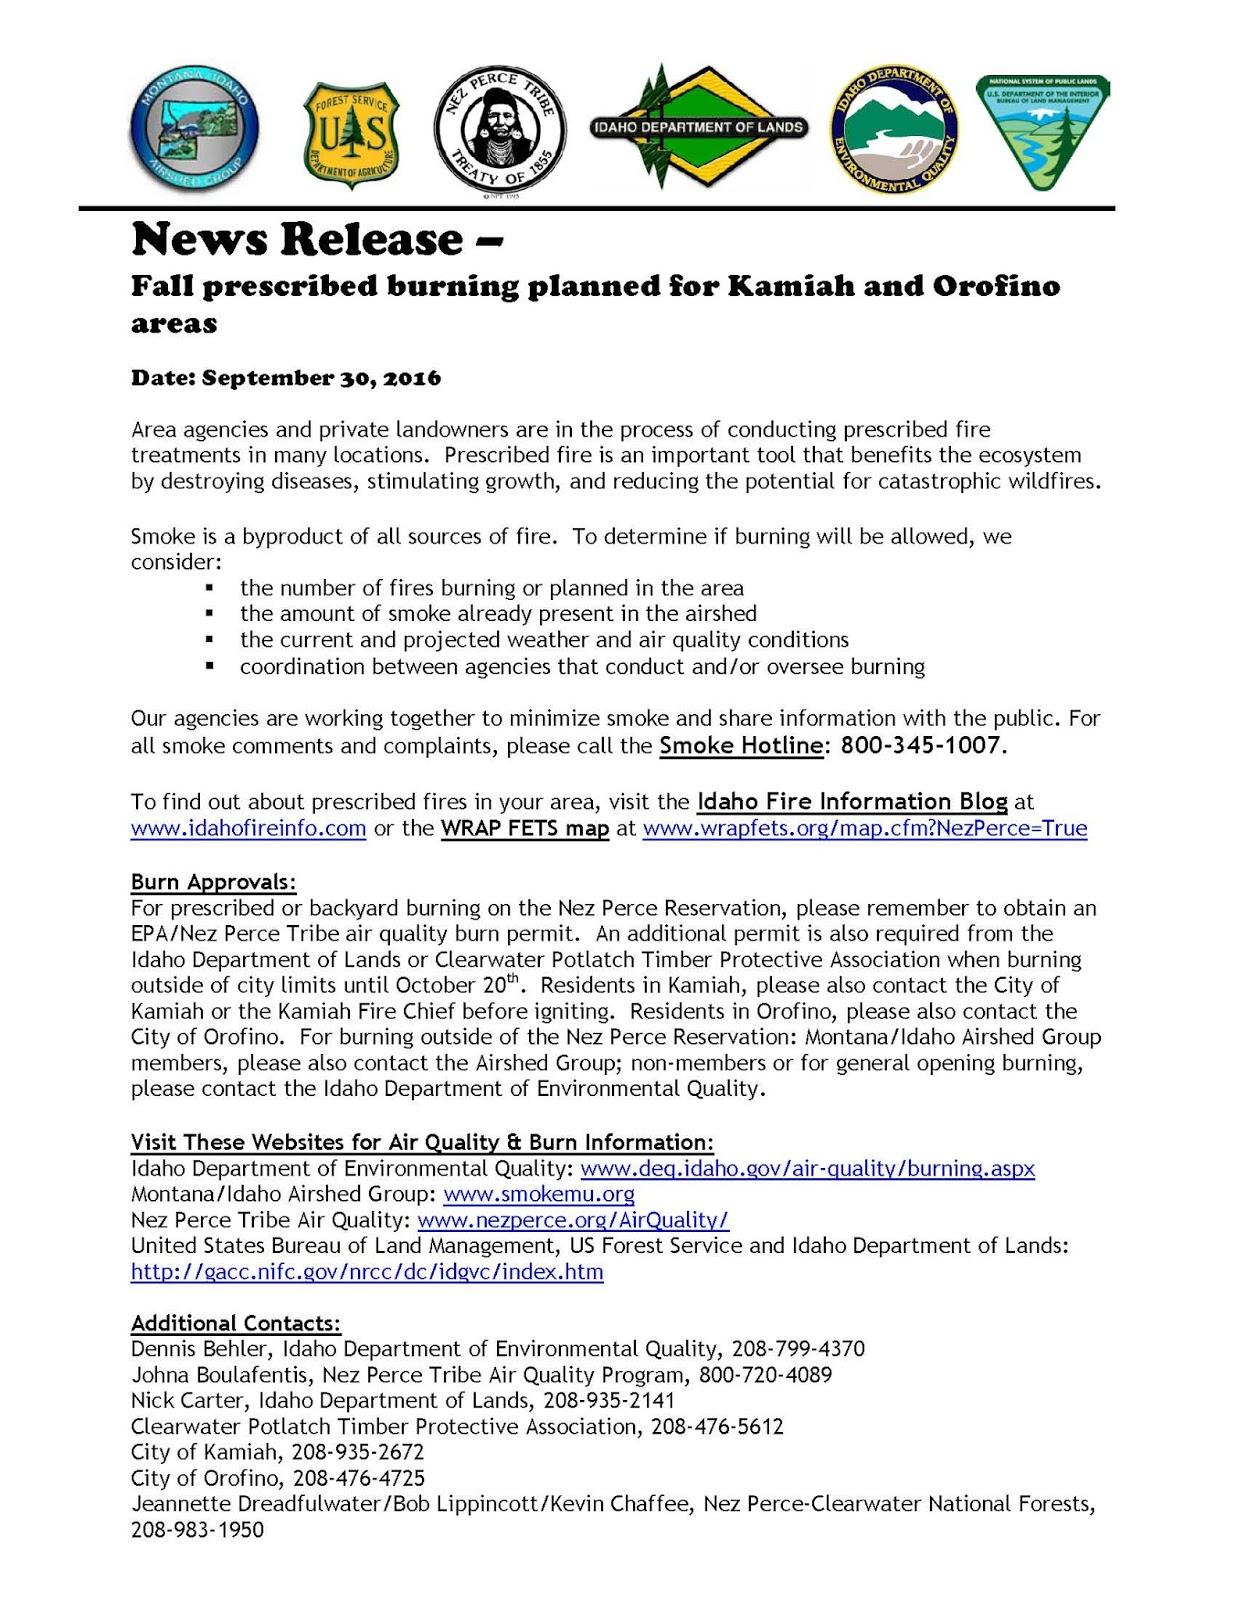 Kamiah Fire Map.Idaho Fire Information September 2016